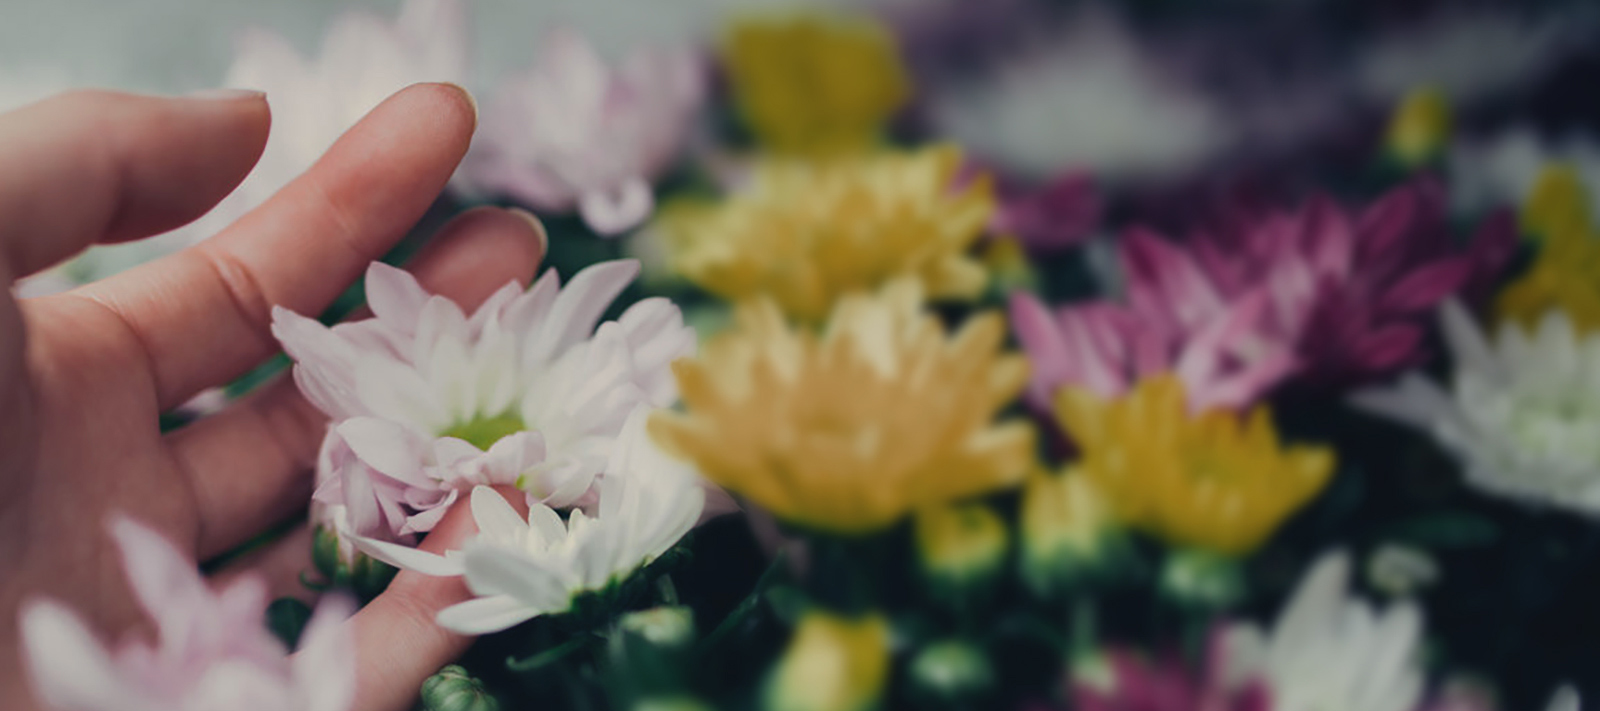 5 Ways to Practice Gratitude & Boost Happiness